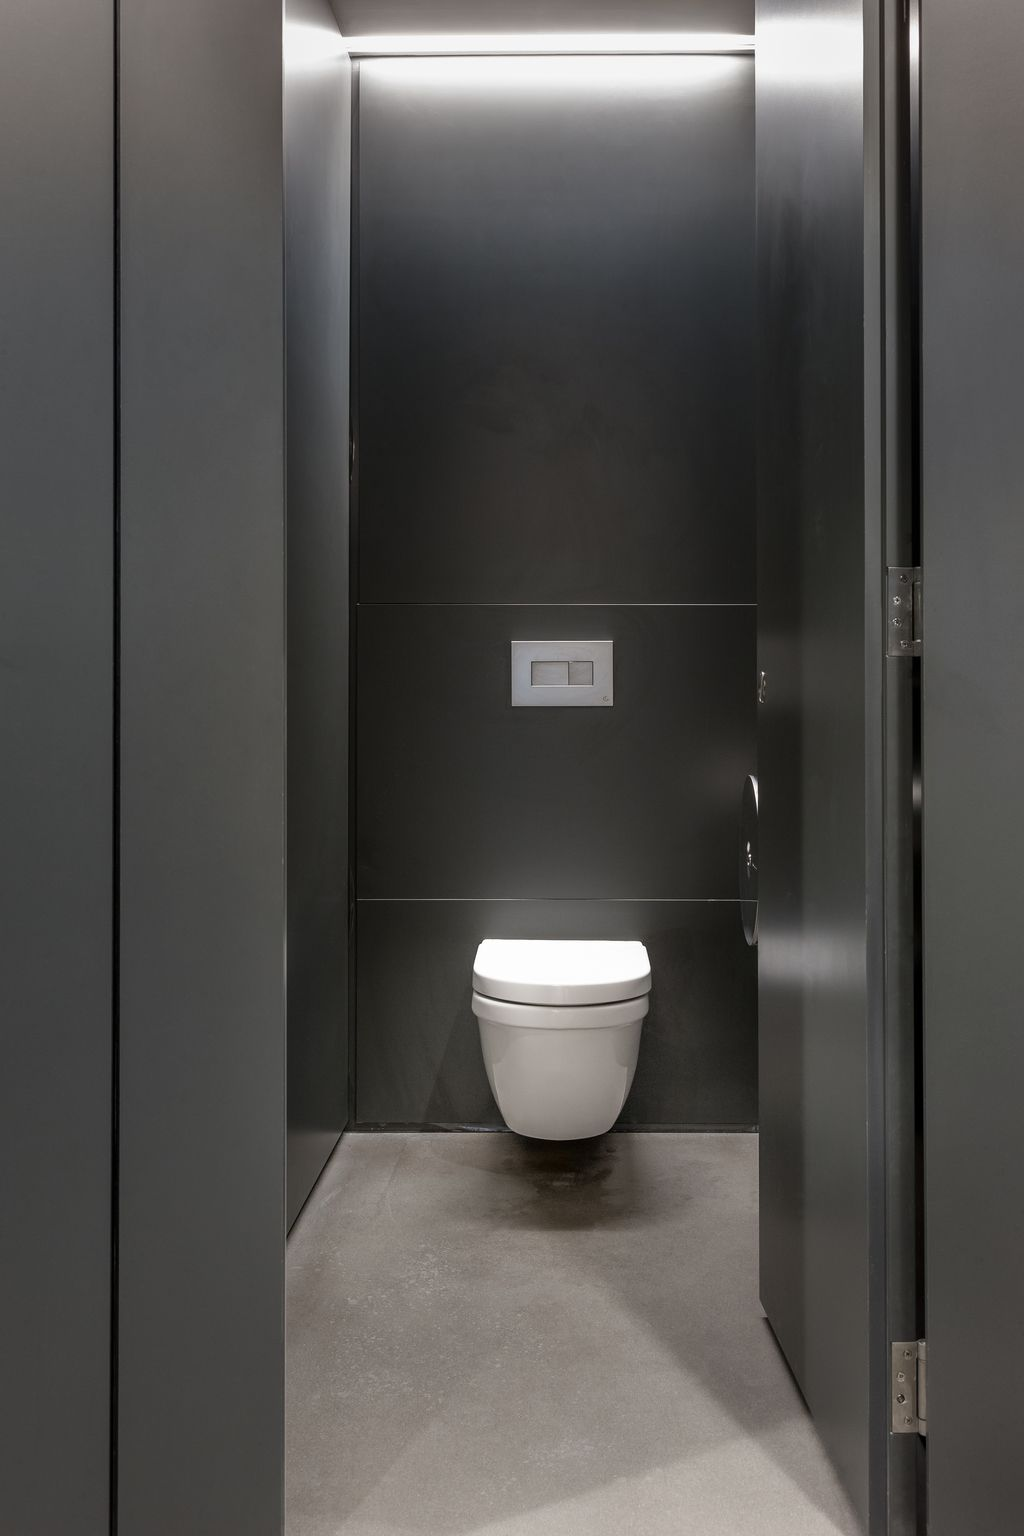 grant westfield façade flush executive washroom cubicle